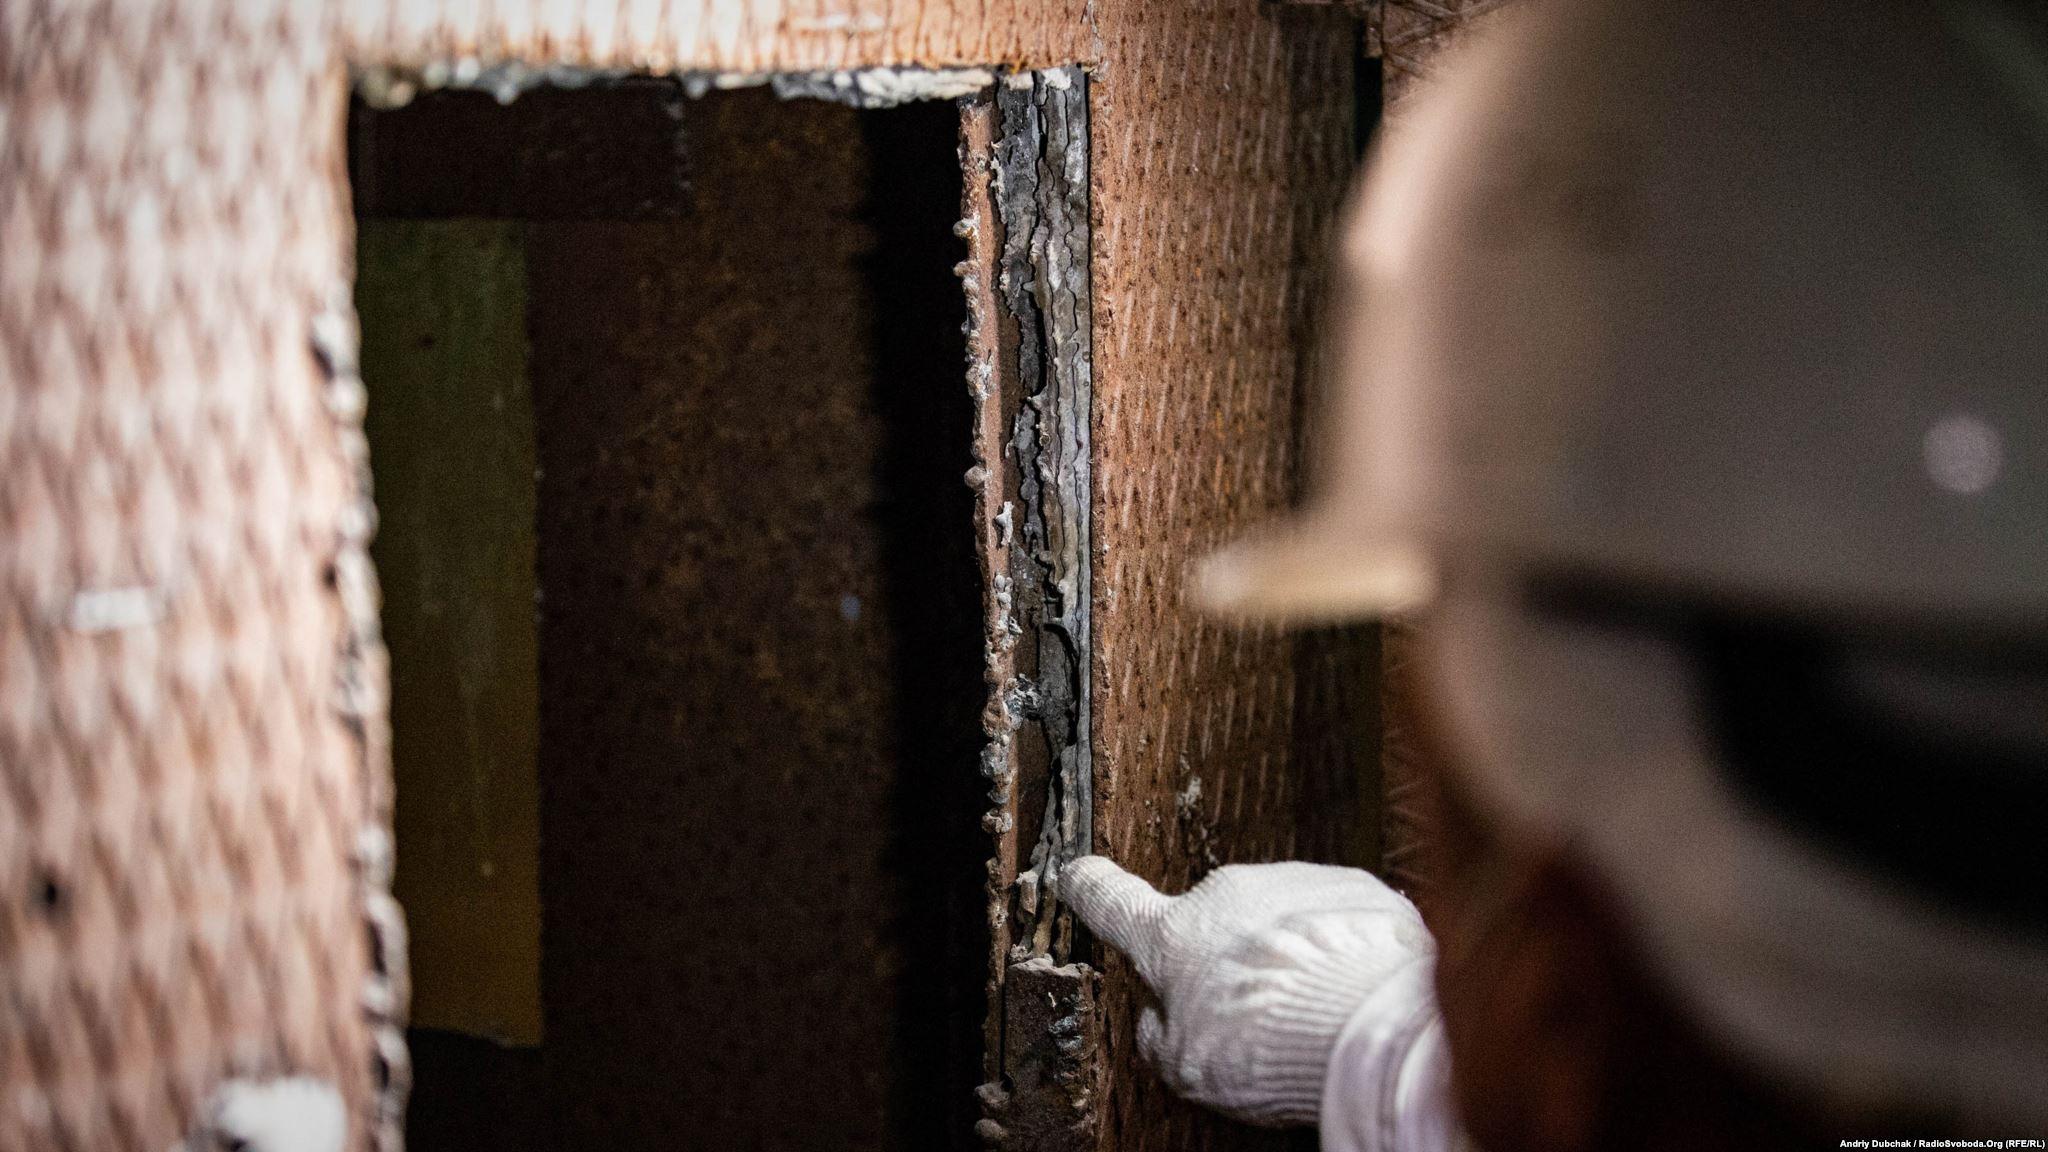 Свинець у стінках «будки дозиметриста» (Photographer: Andriy Dubchak)